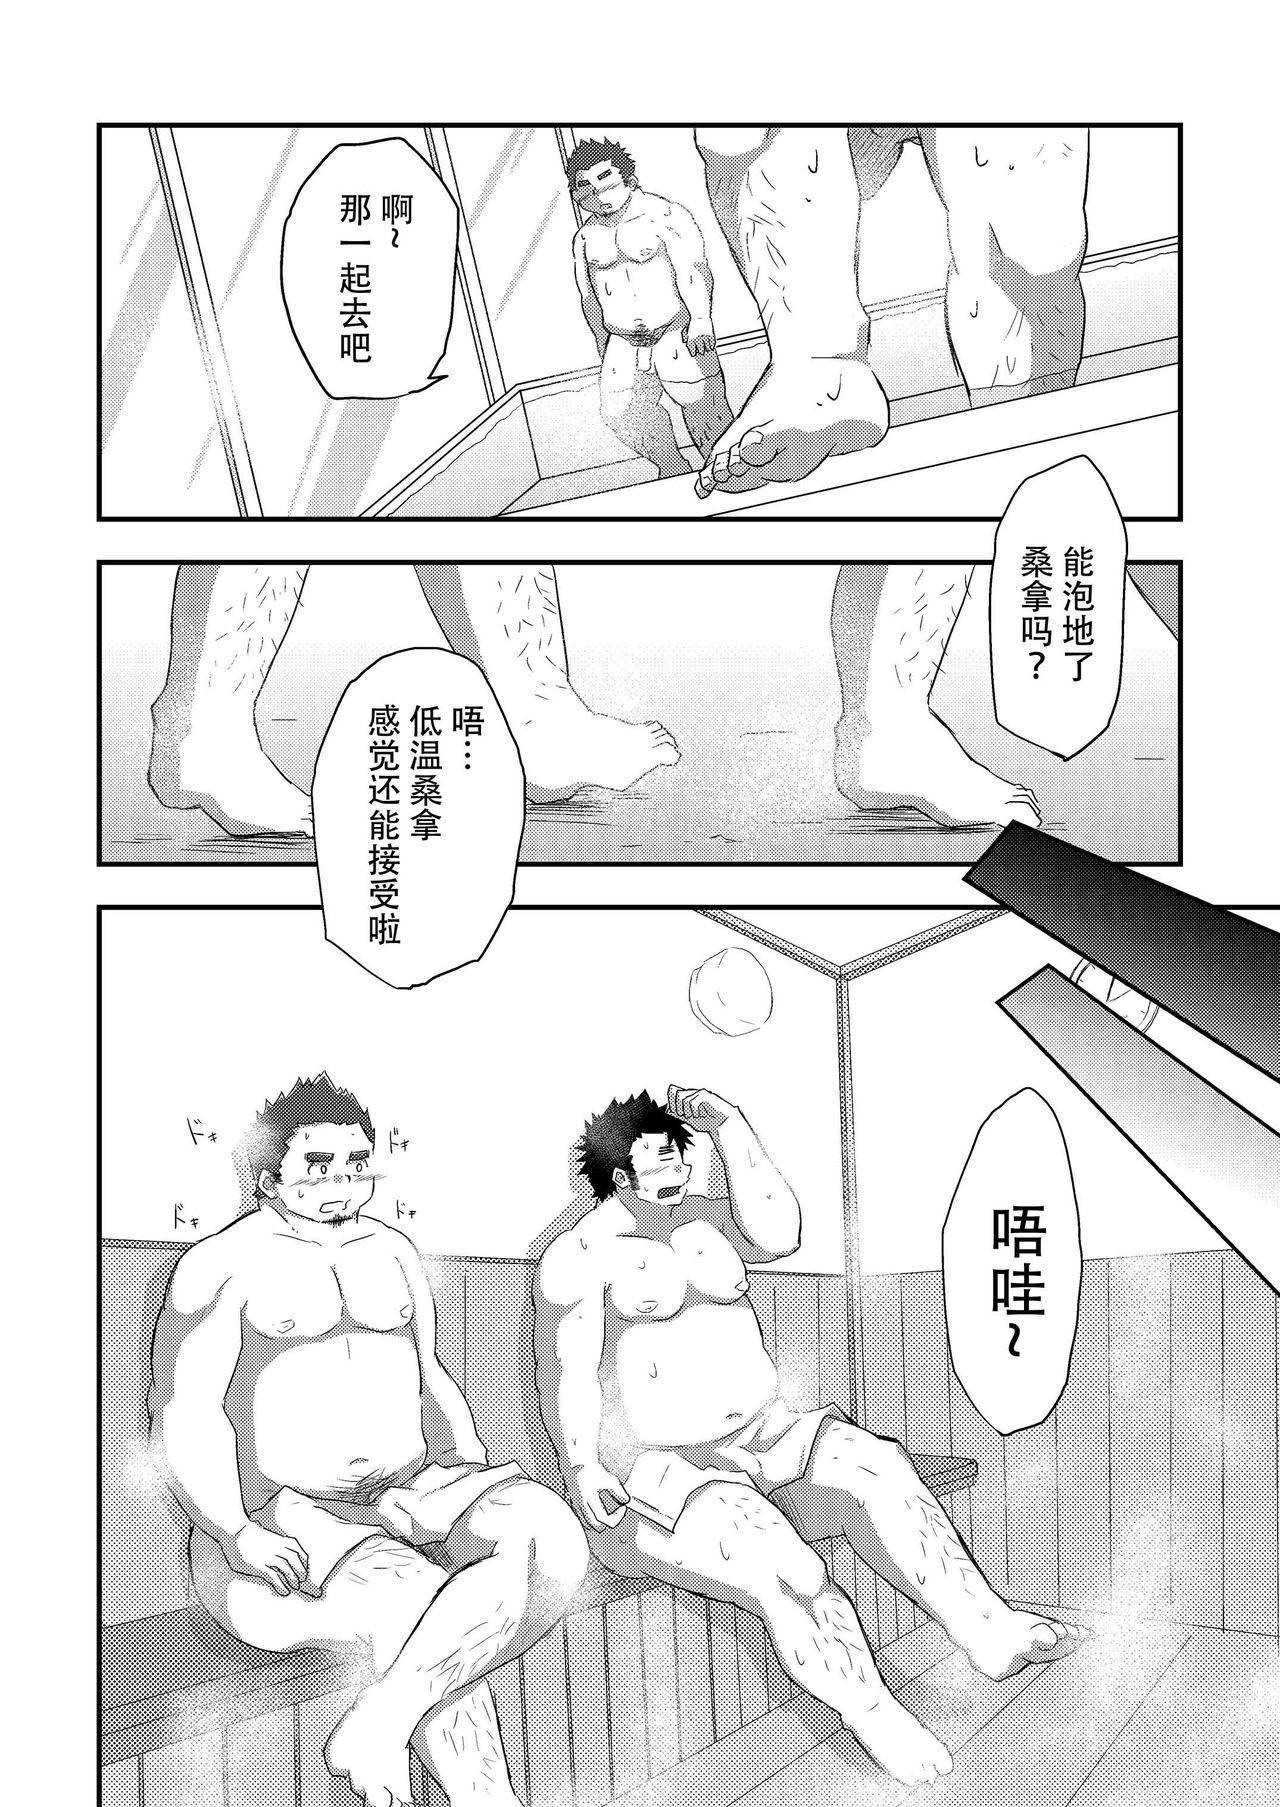 [CorkBOX (ngng)] Ise-kun wa Tamatte Iru. - Ise-kun is horny. [Chinese] {日曜日汉化} [Digital] 8